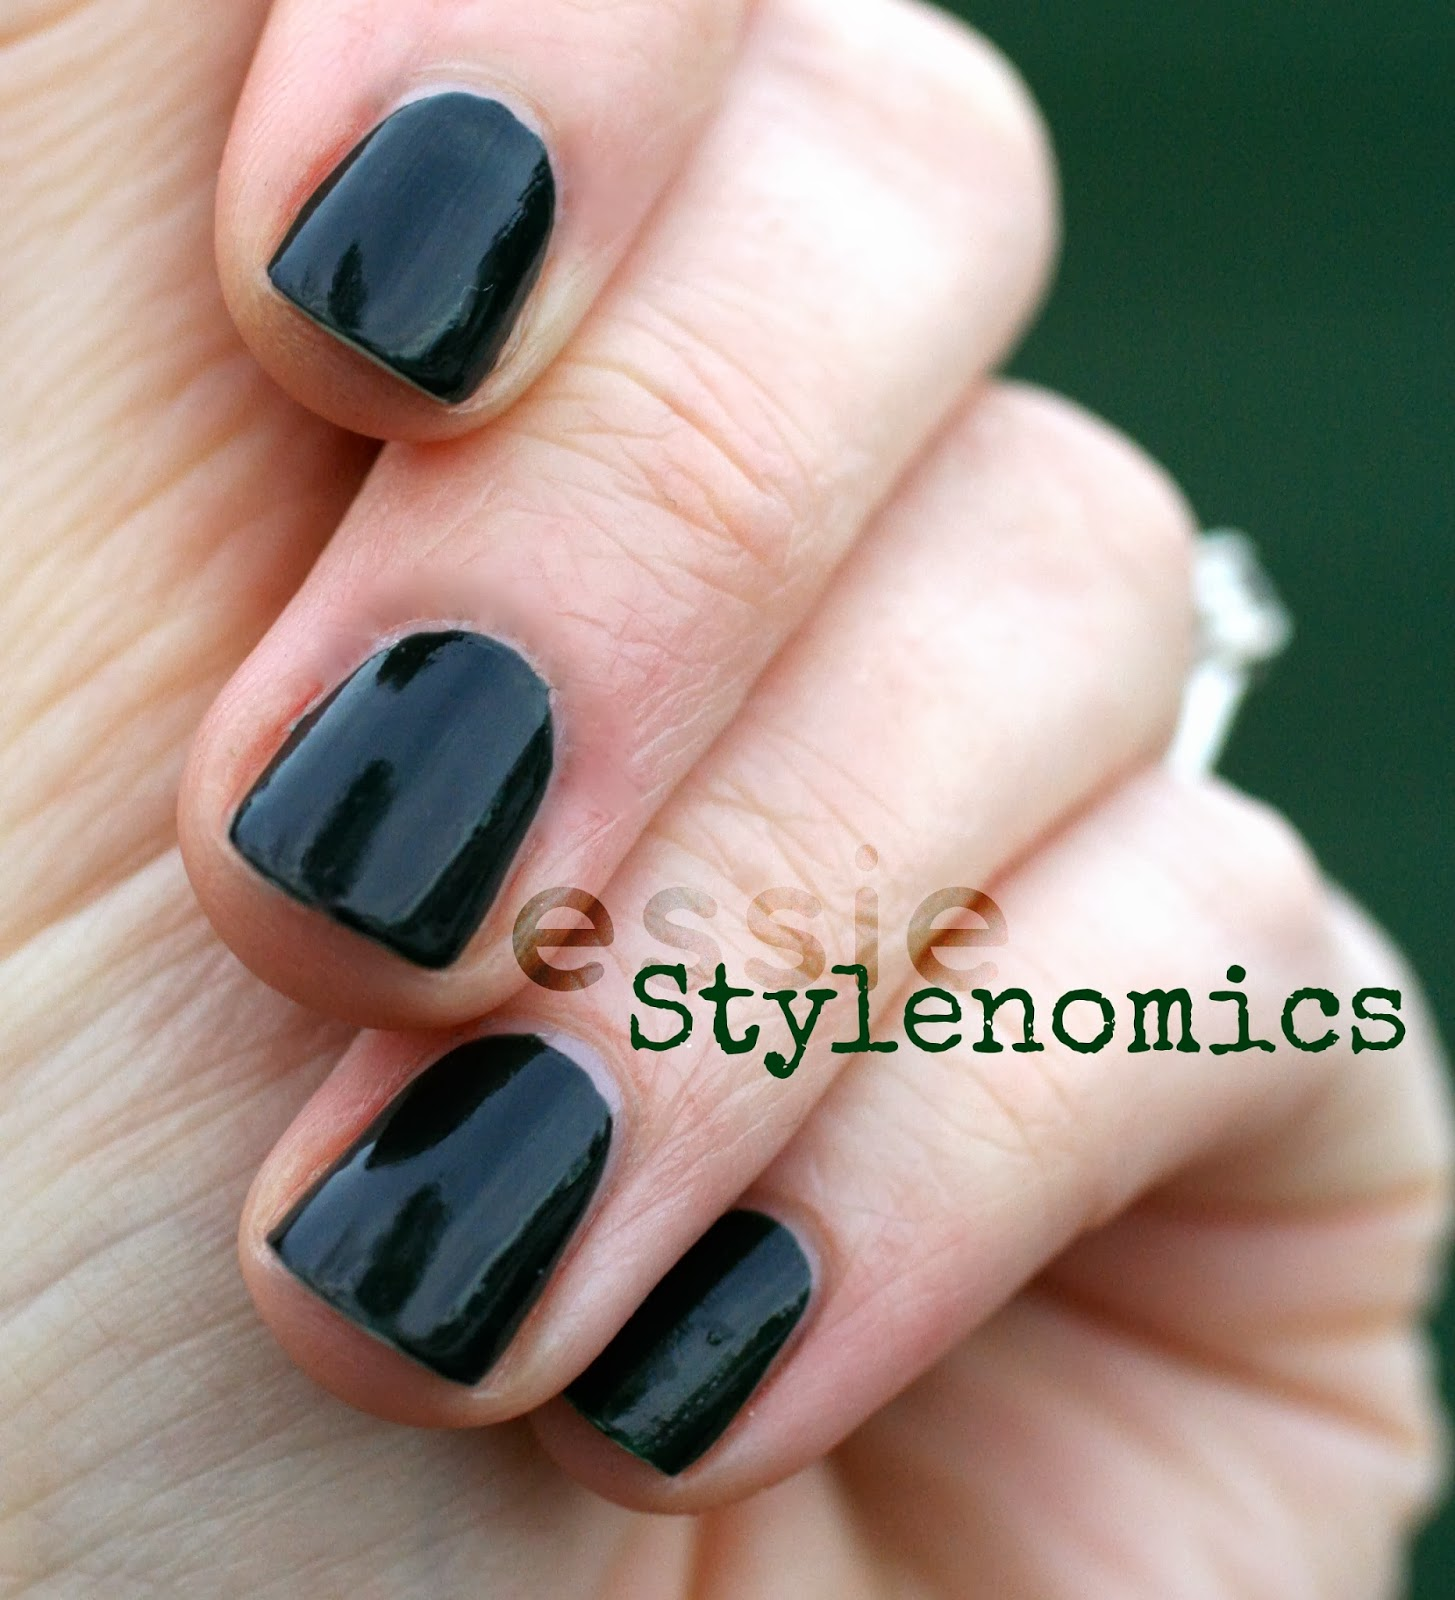 Essie stylenomics